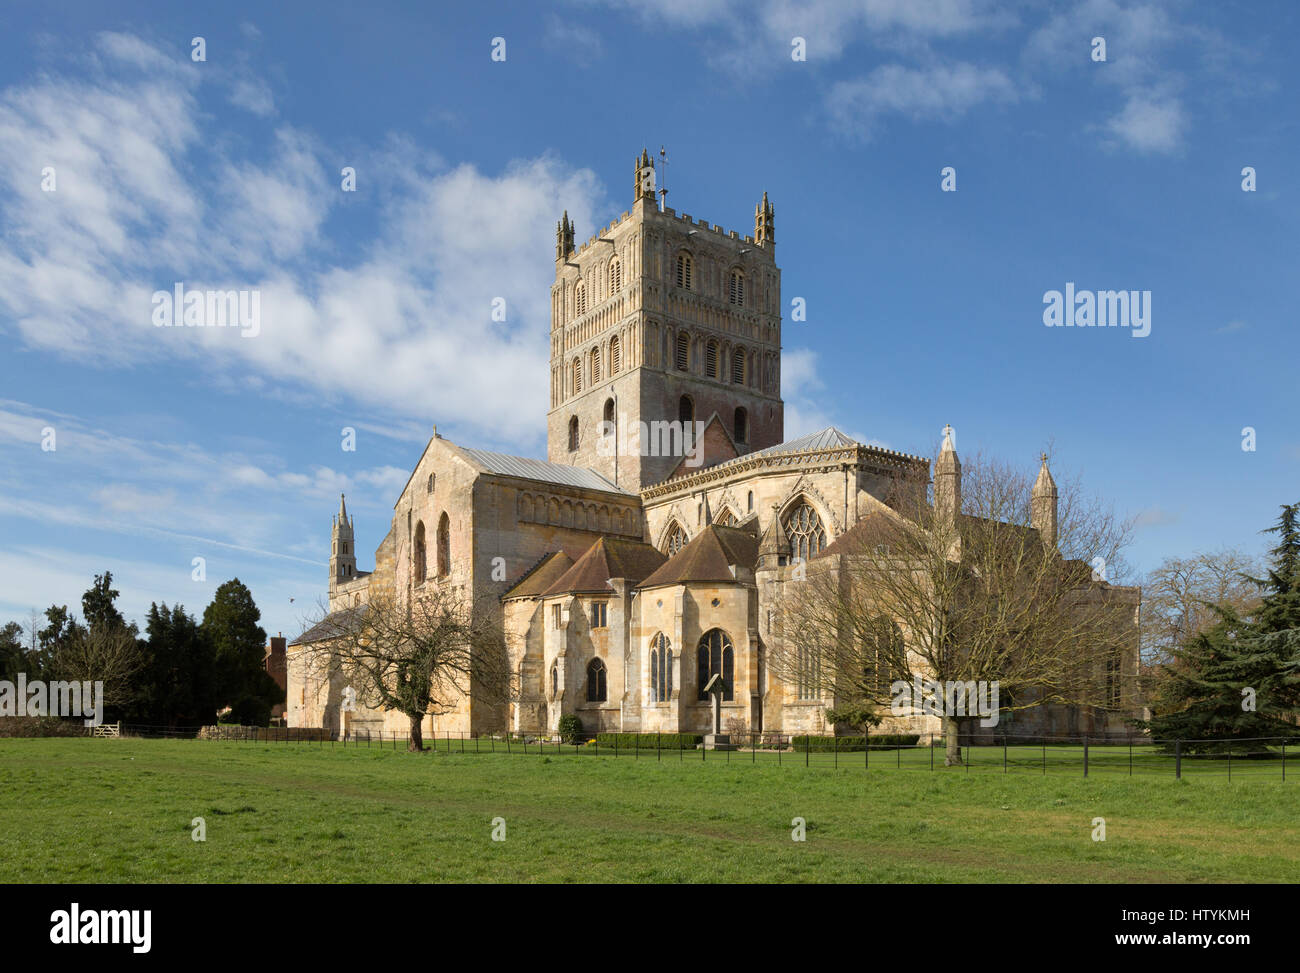 Tewkesbury Abbey, Gloucestershire UK - Stock Image